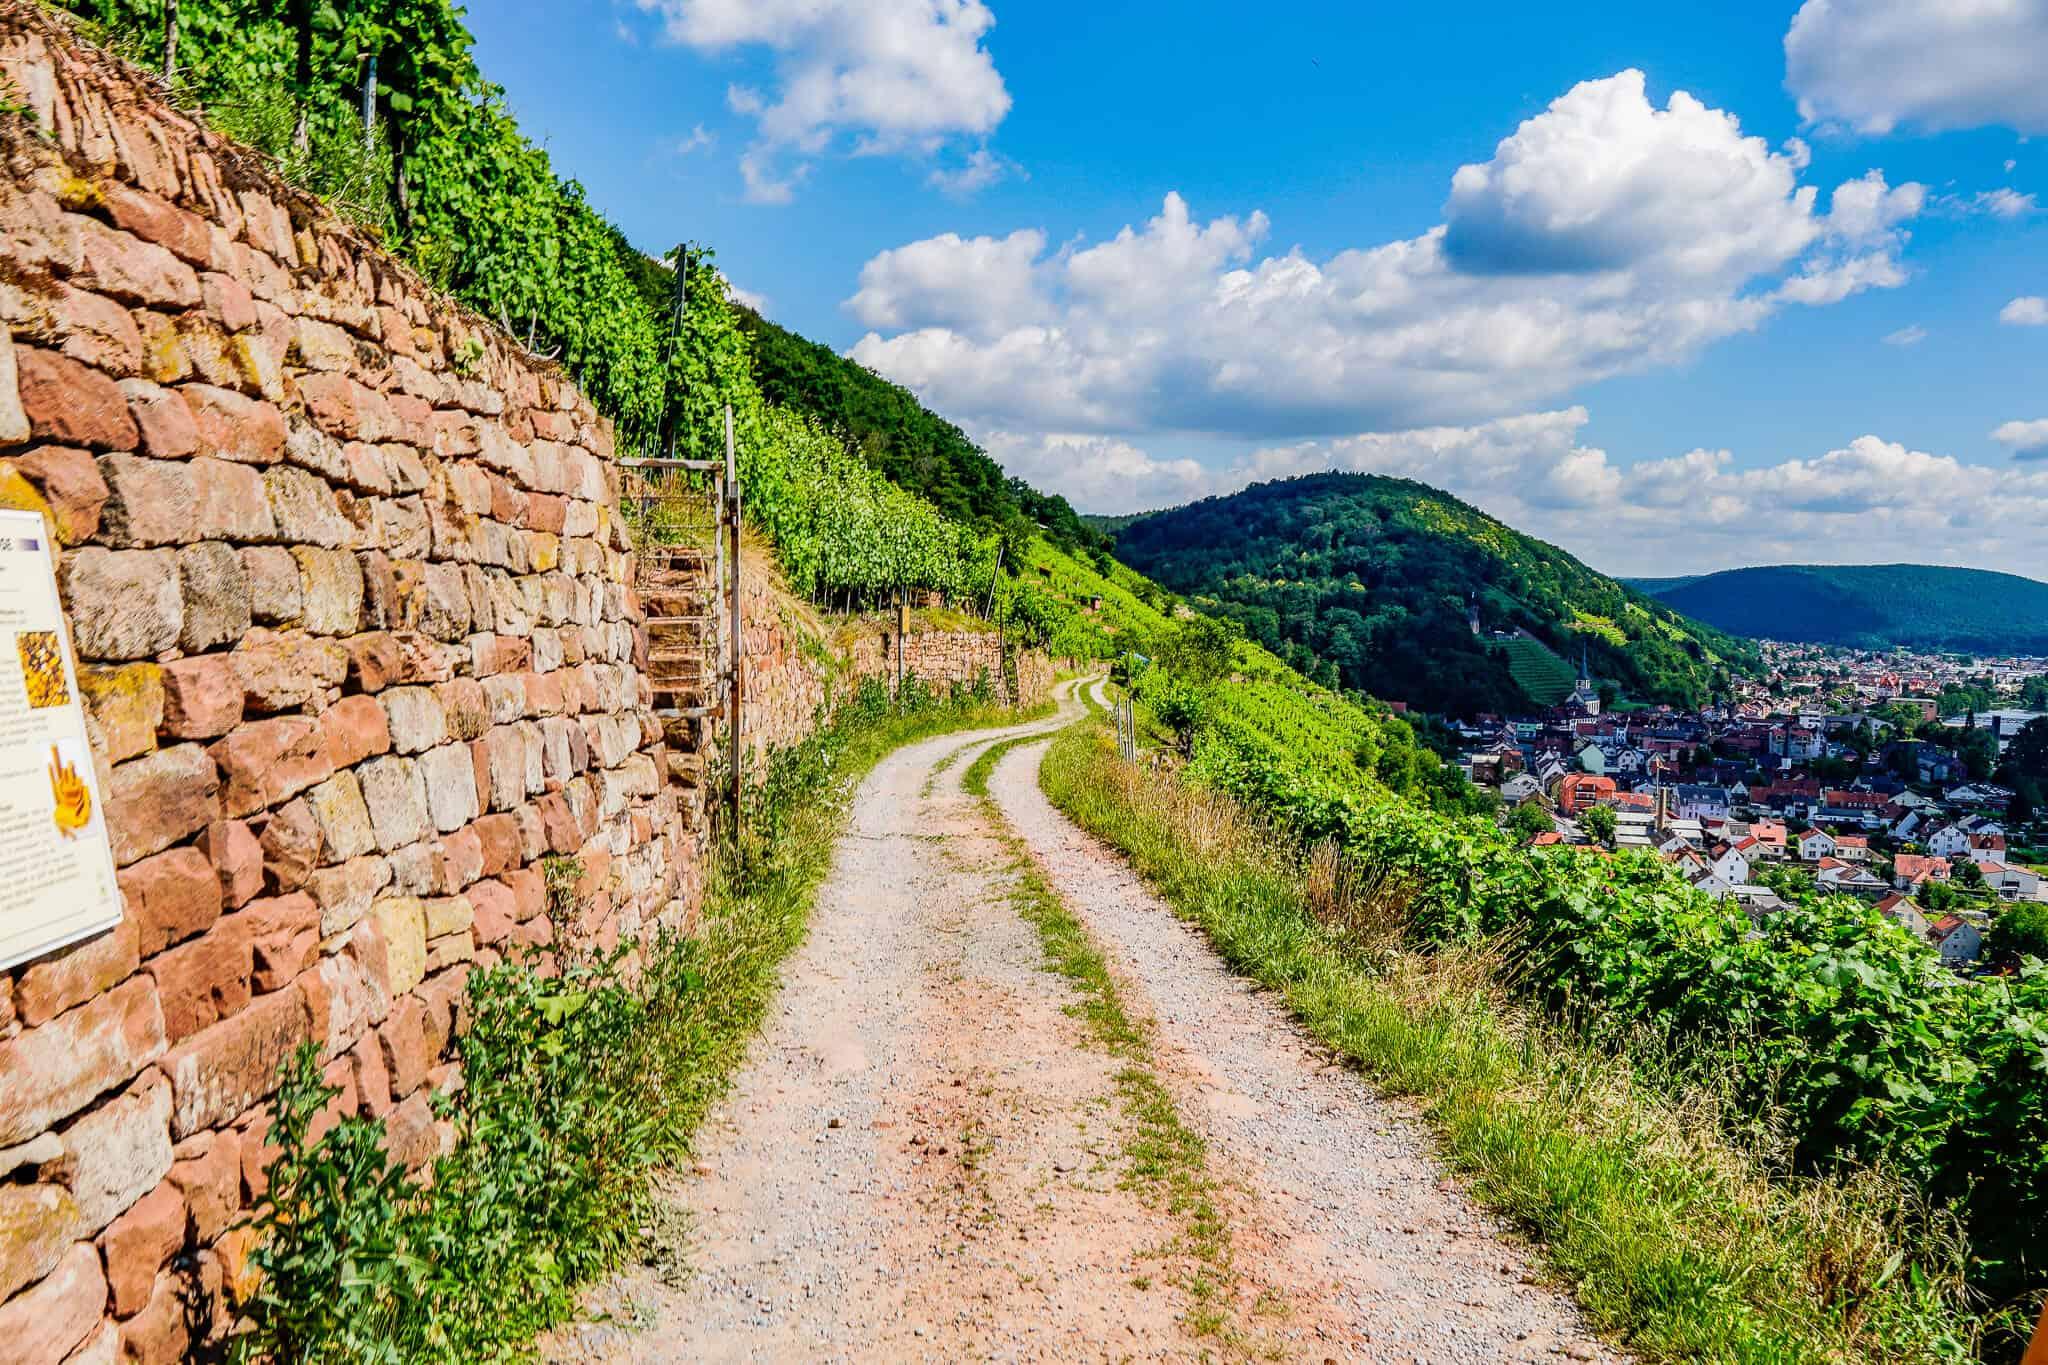 Rotwein Wanderweg Klingenberg